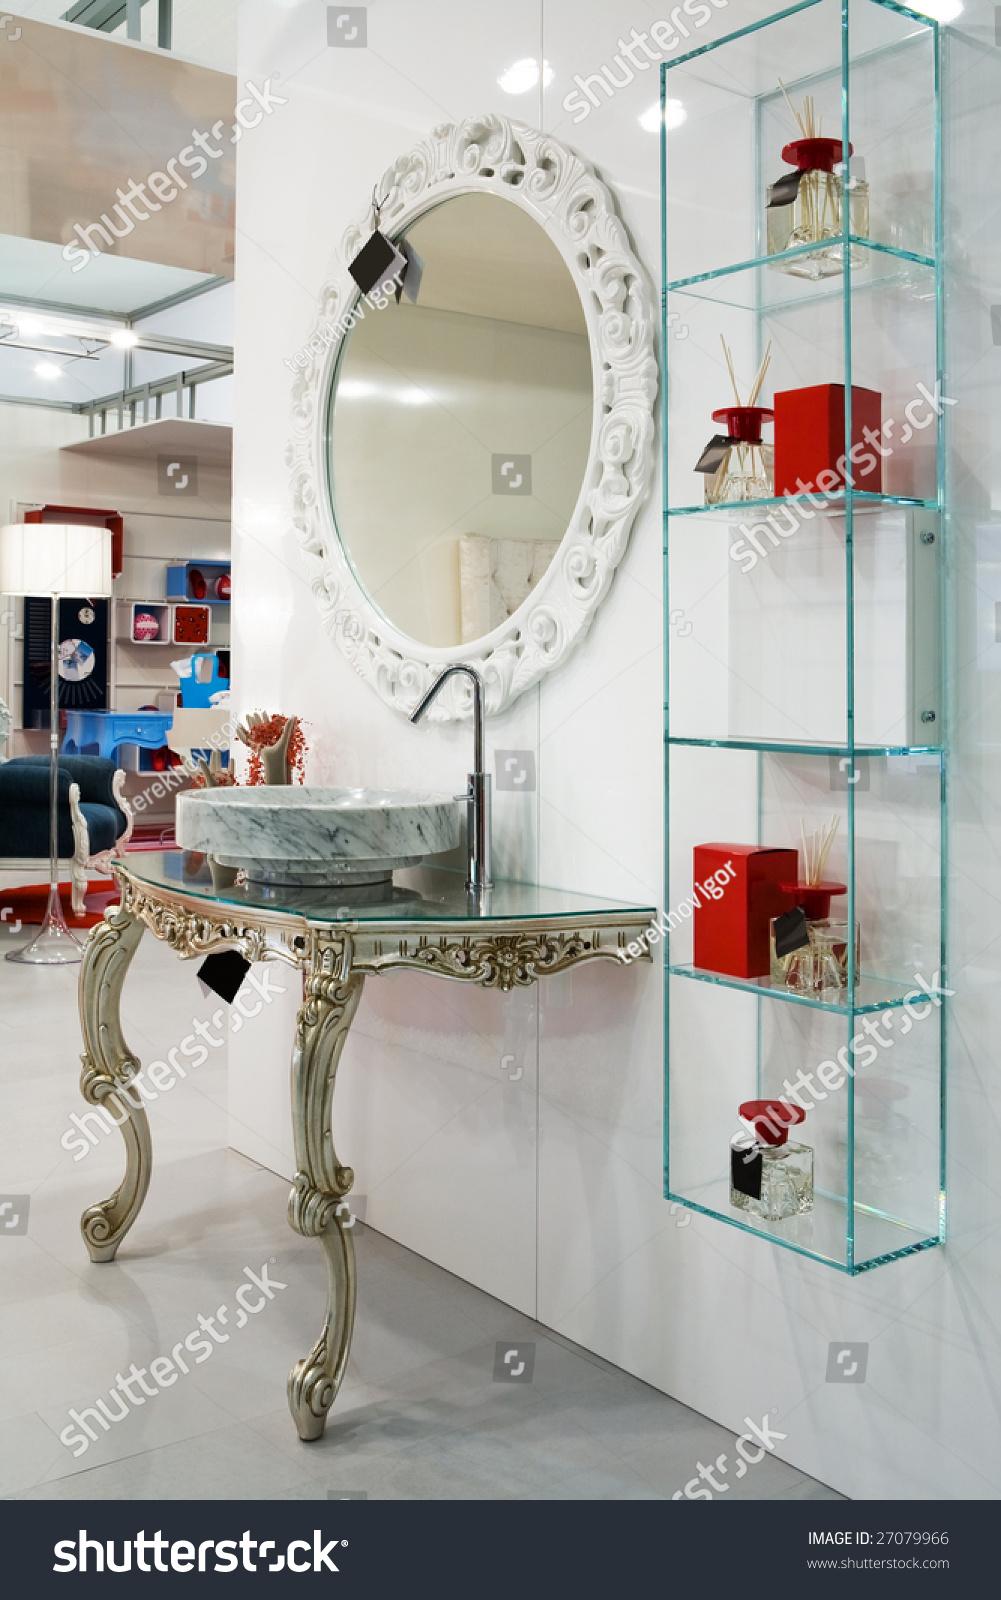 Beautiful And Modern Furniture In Furniture Store Stock Photo 27079966 Shutterstock